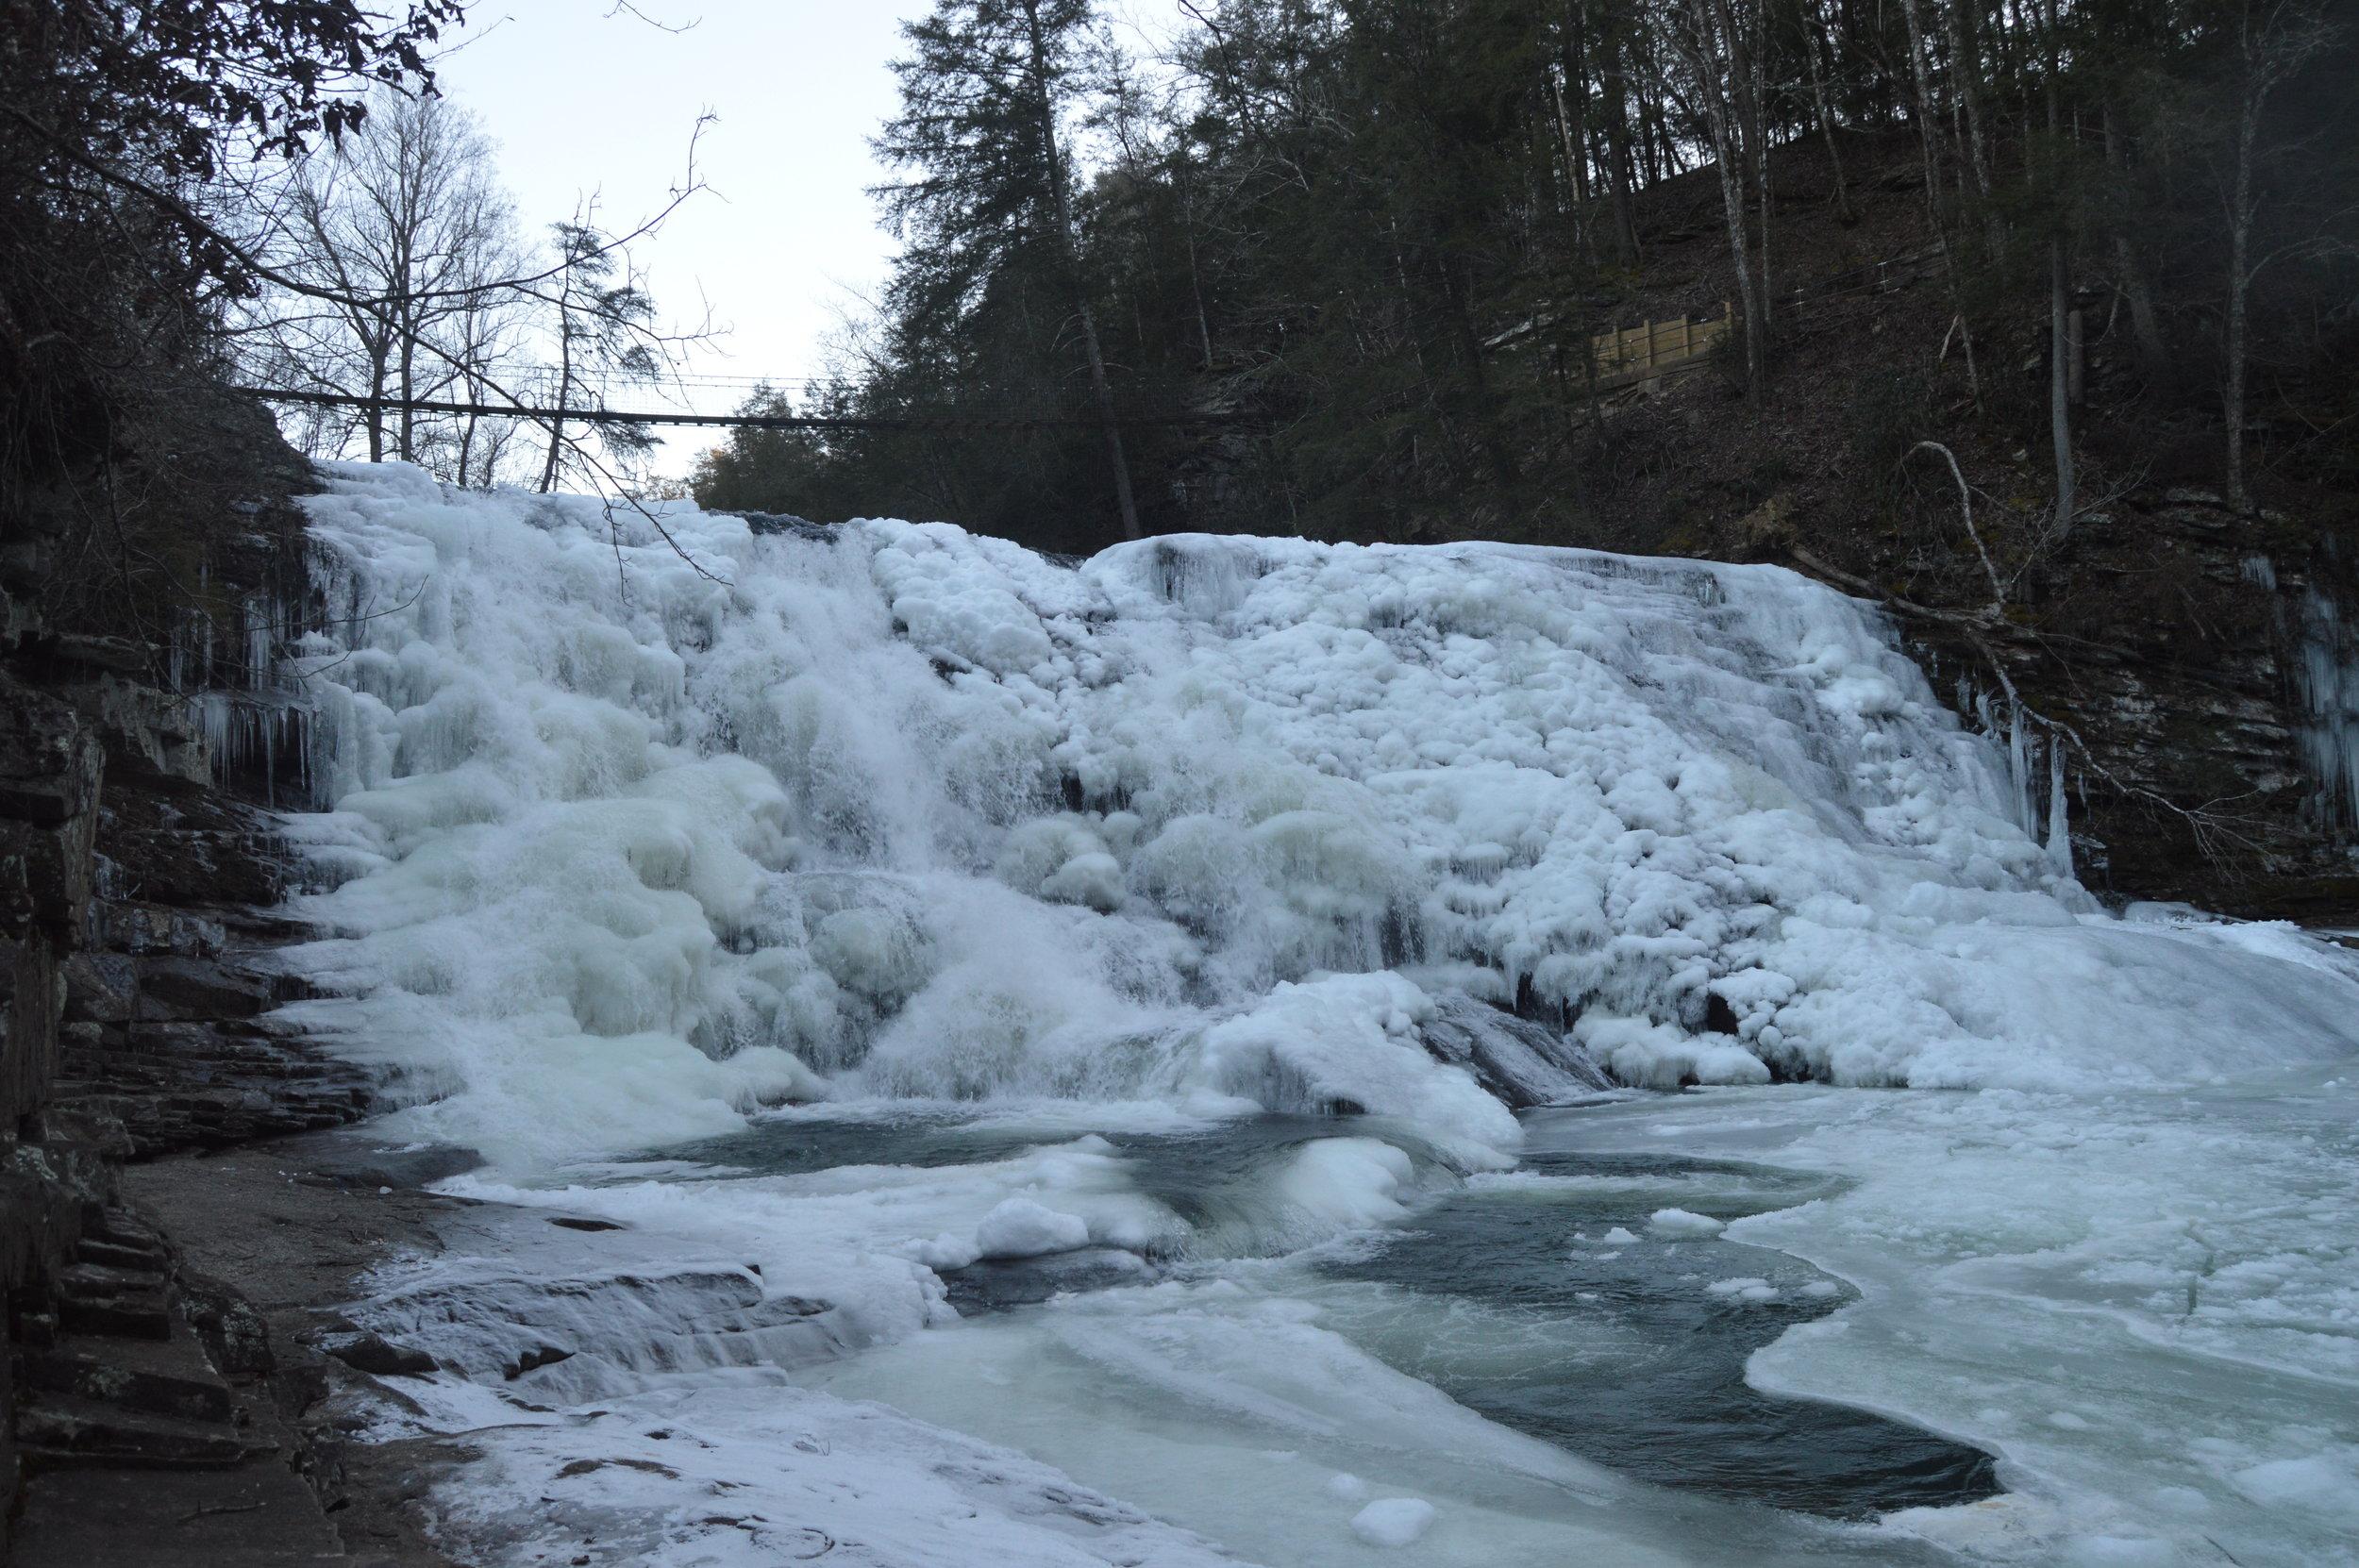 A frozen Cane Creek Cascades in January 2018.